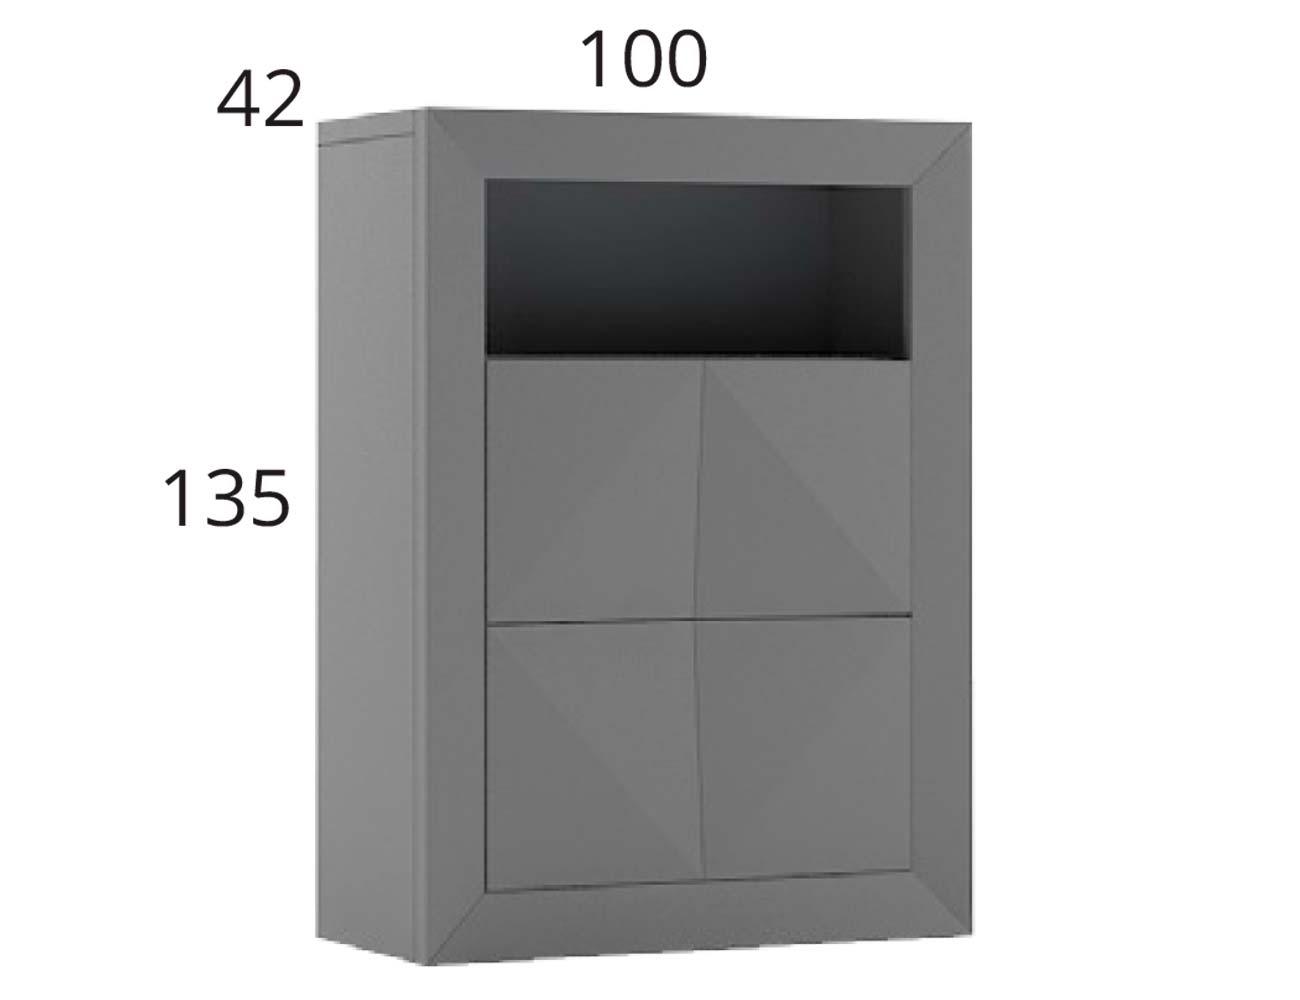 A0531